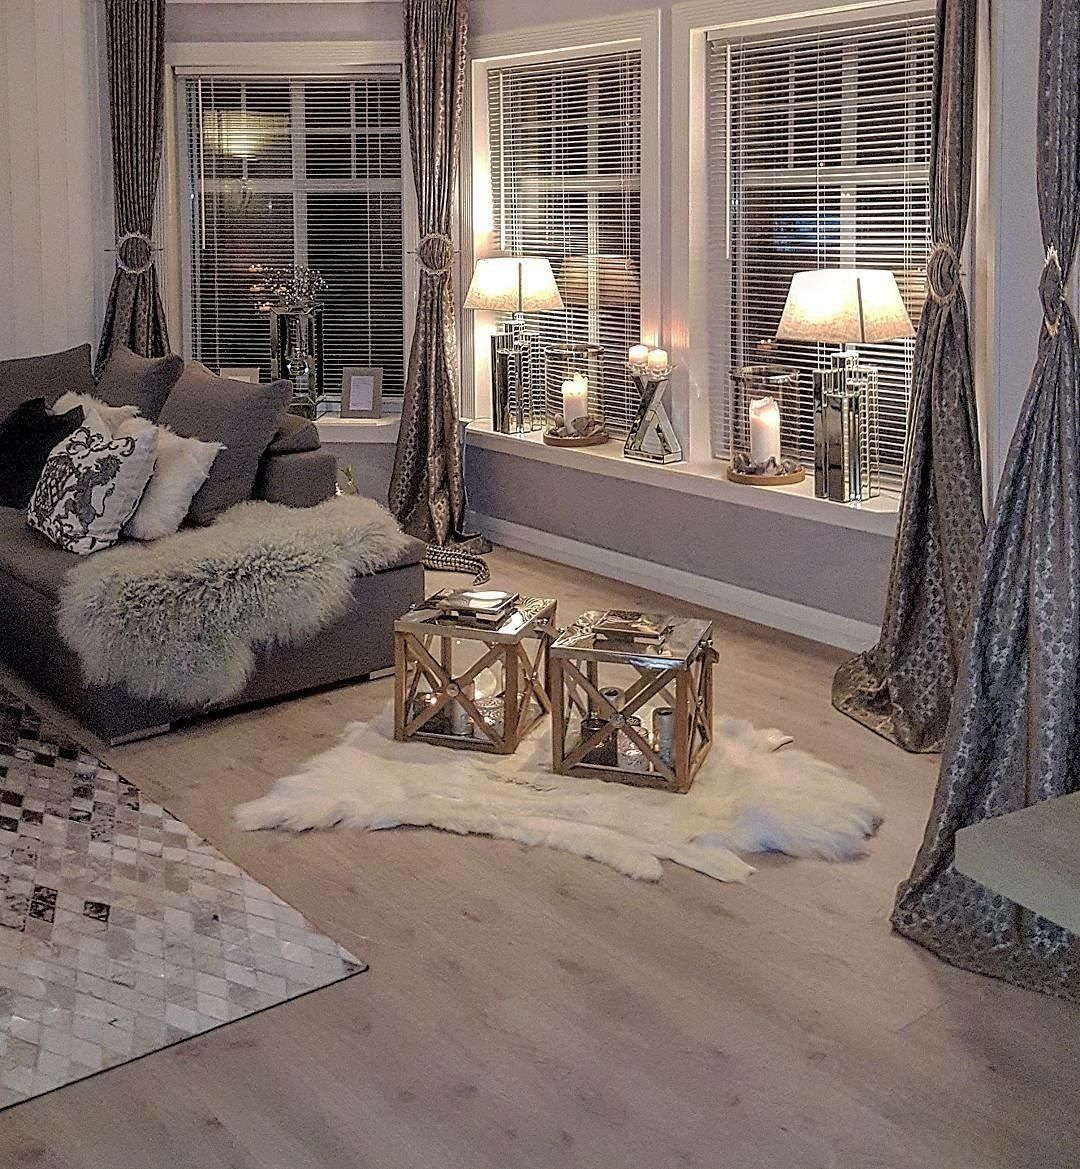 Cozy Livng Room Ideas 150 The Urban Interior Apart